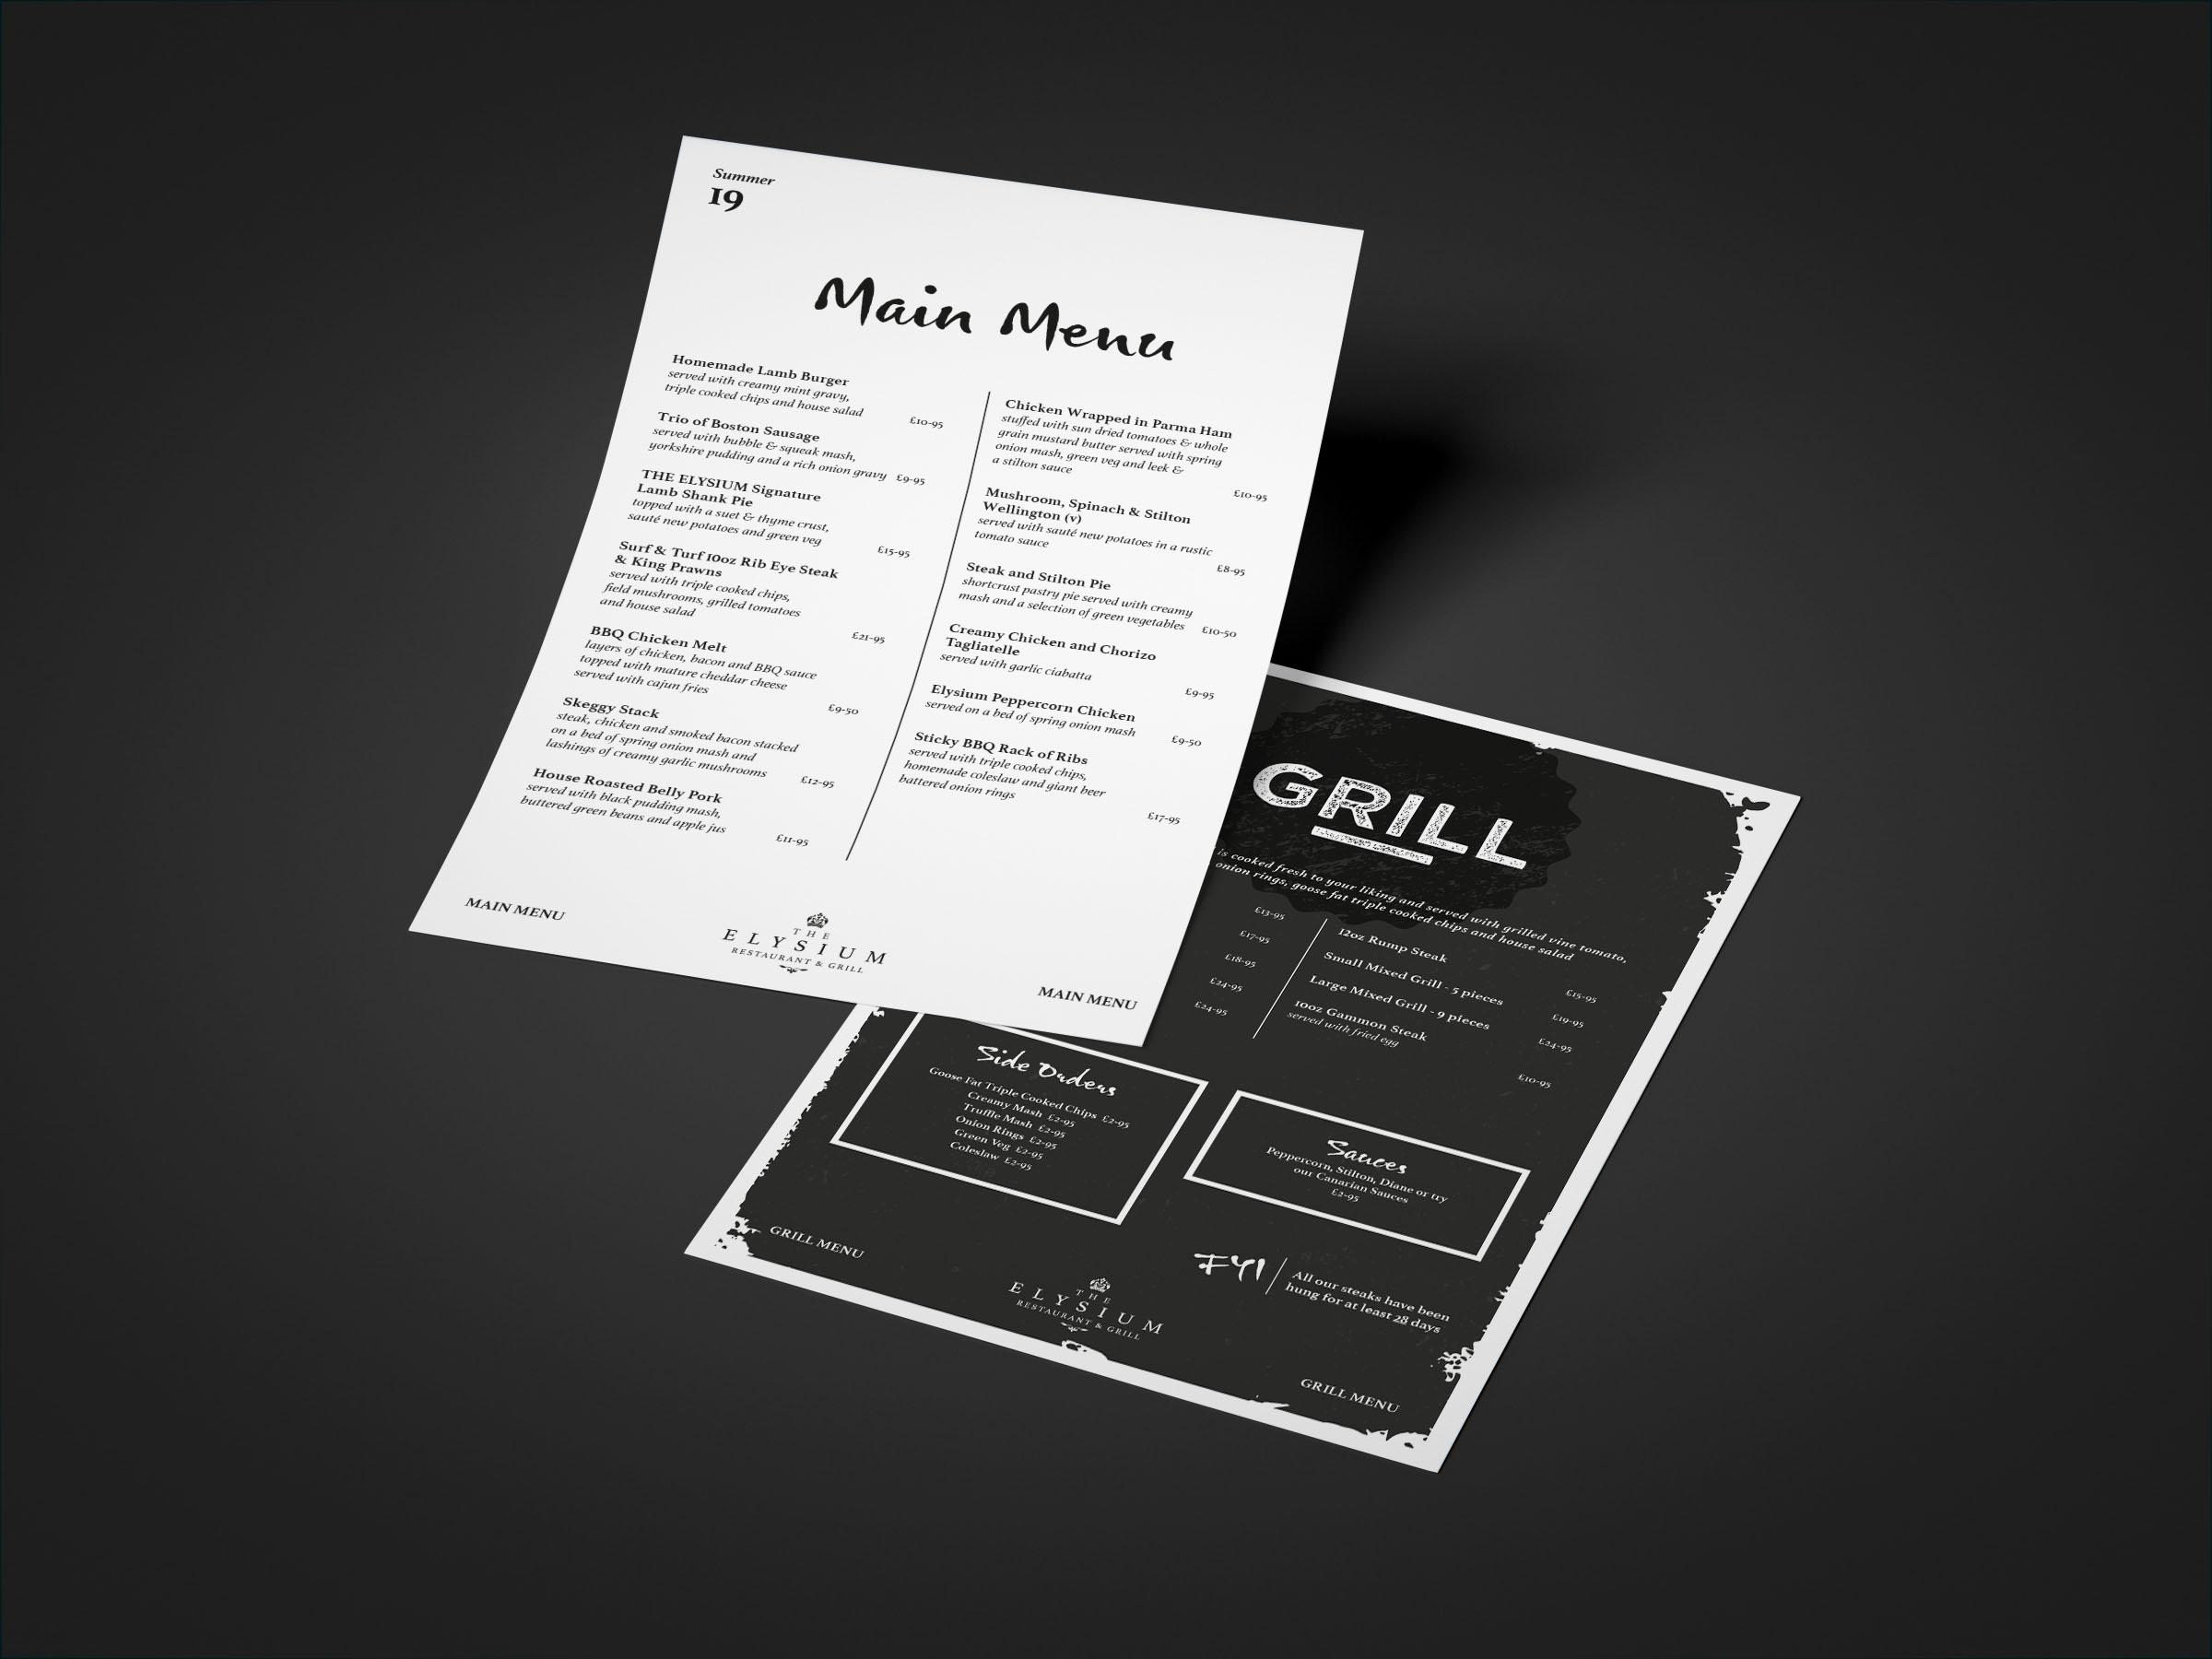 Elysium Menu Design